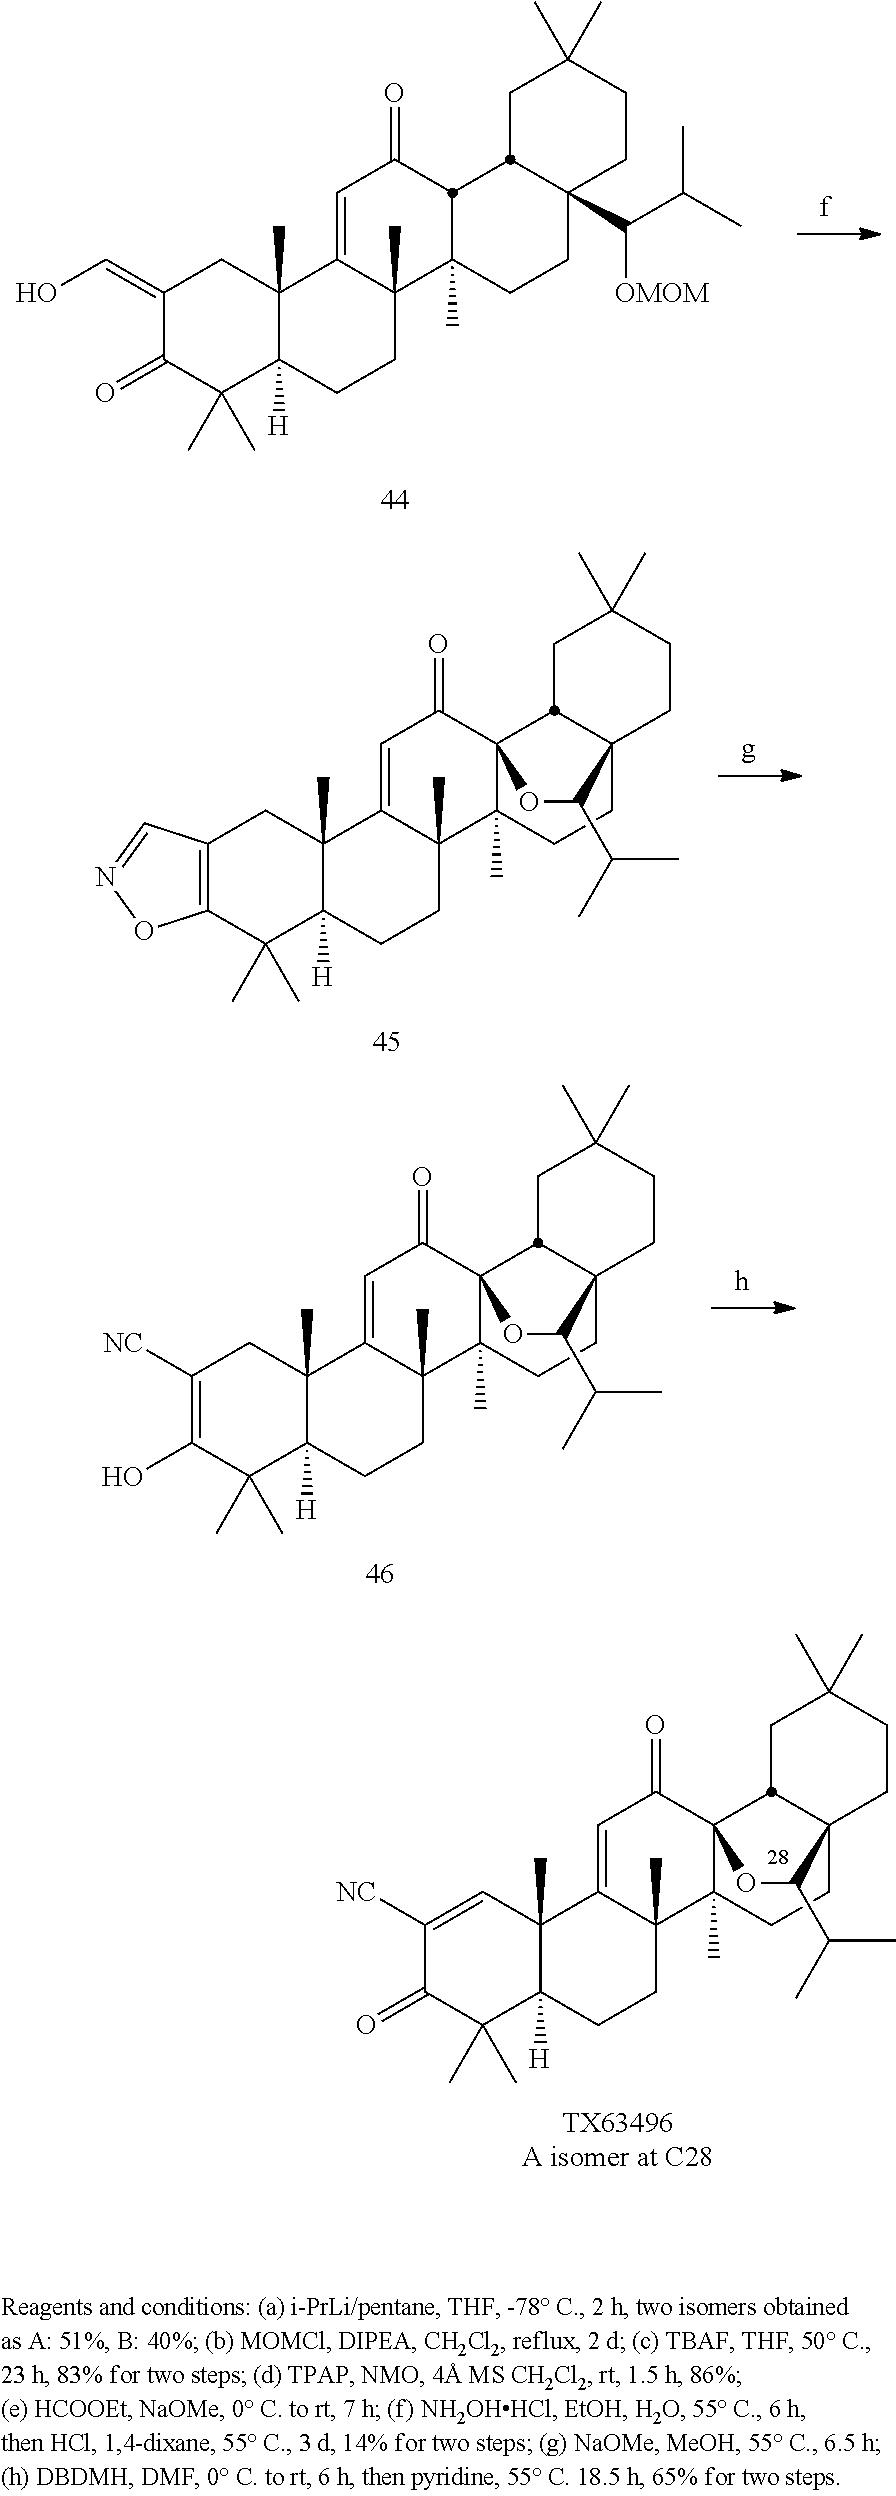 us9278912b2 c13 hydroxy derivatives of oleanolic acid and methods Asco Model 940 figure us09278912 20160308 c00043